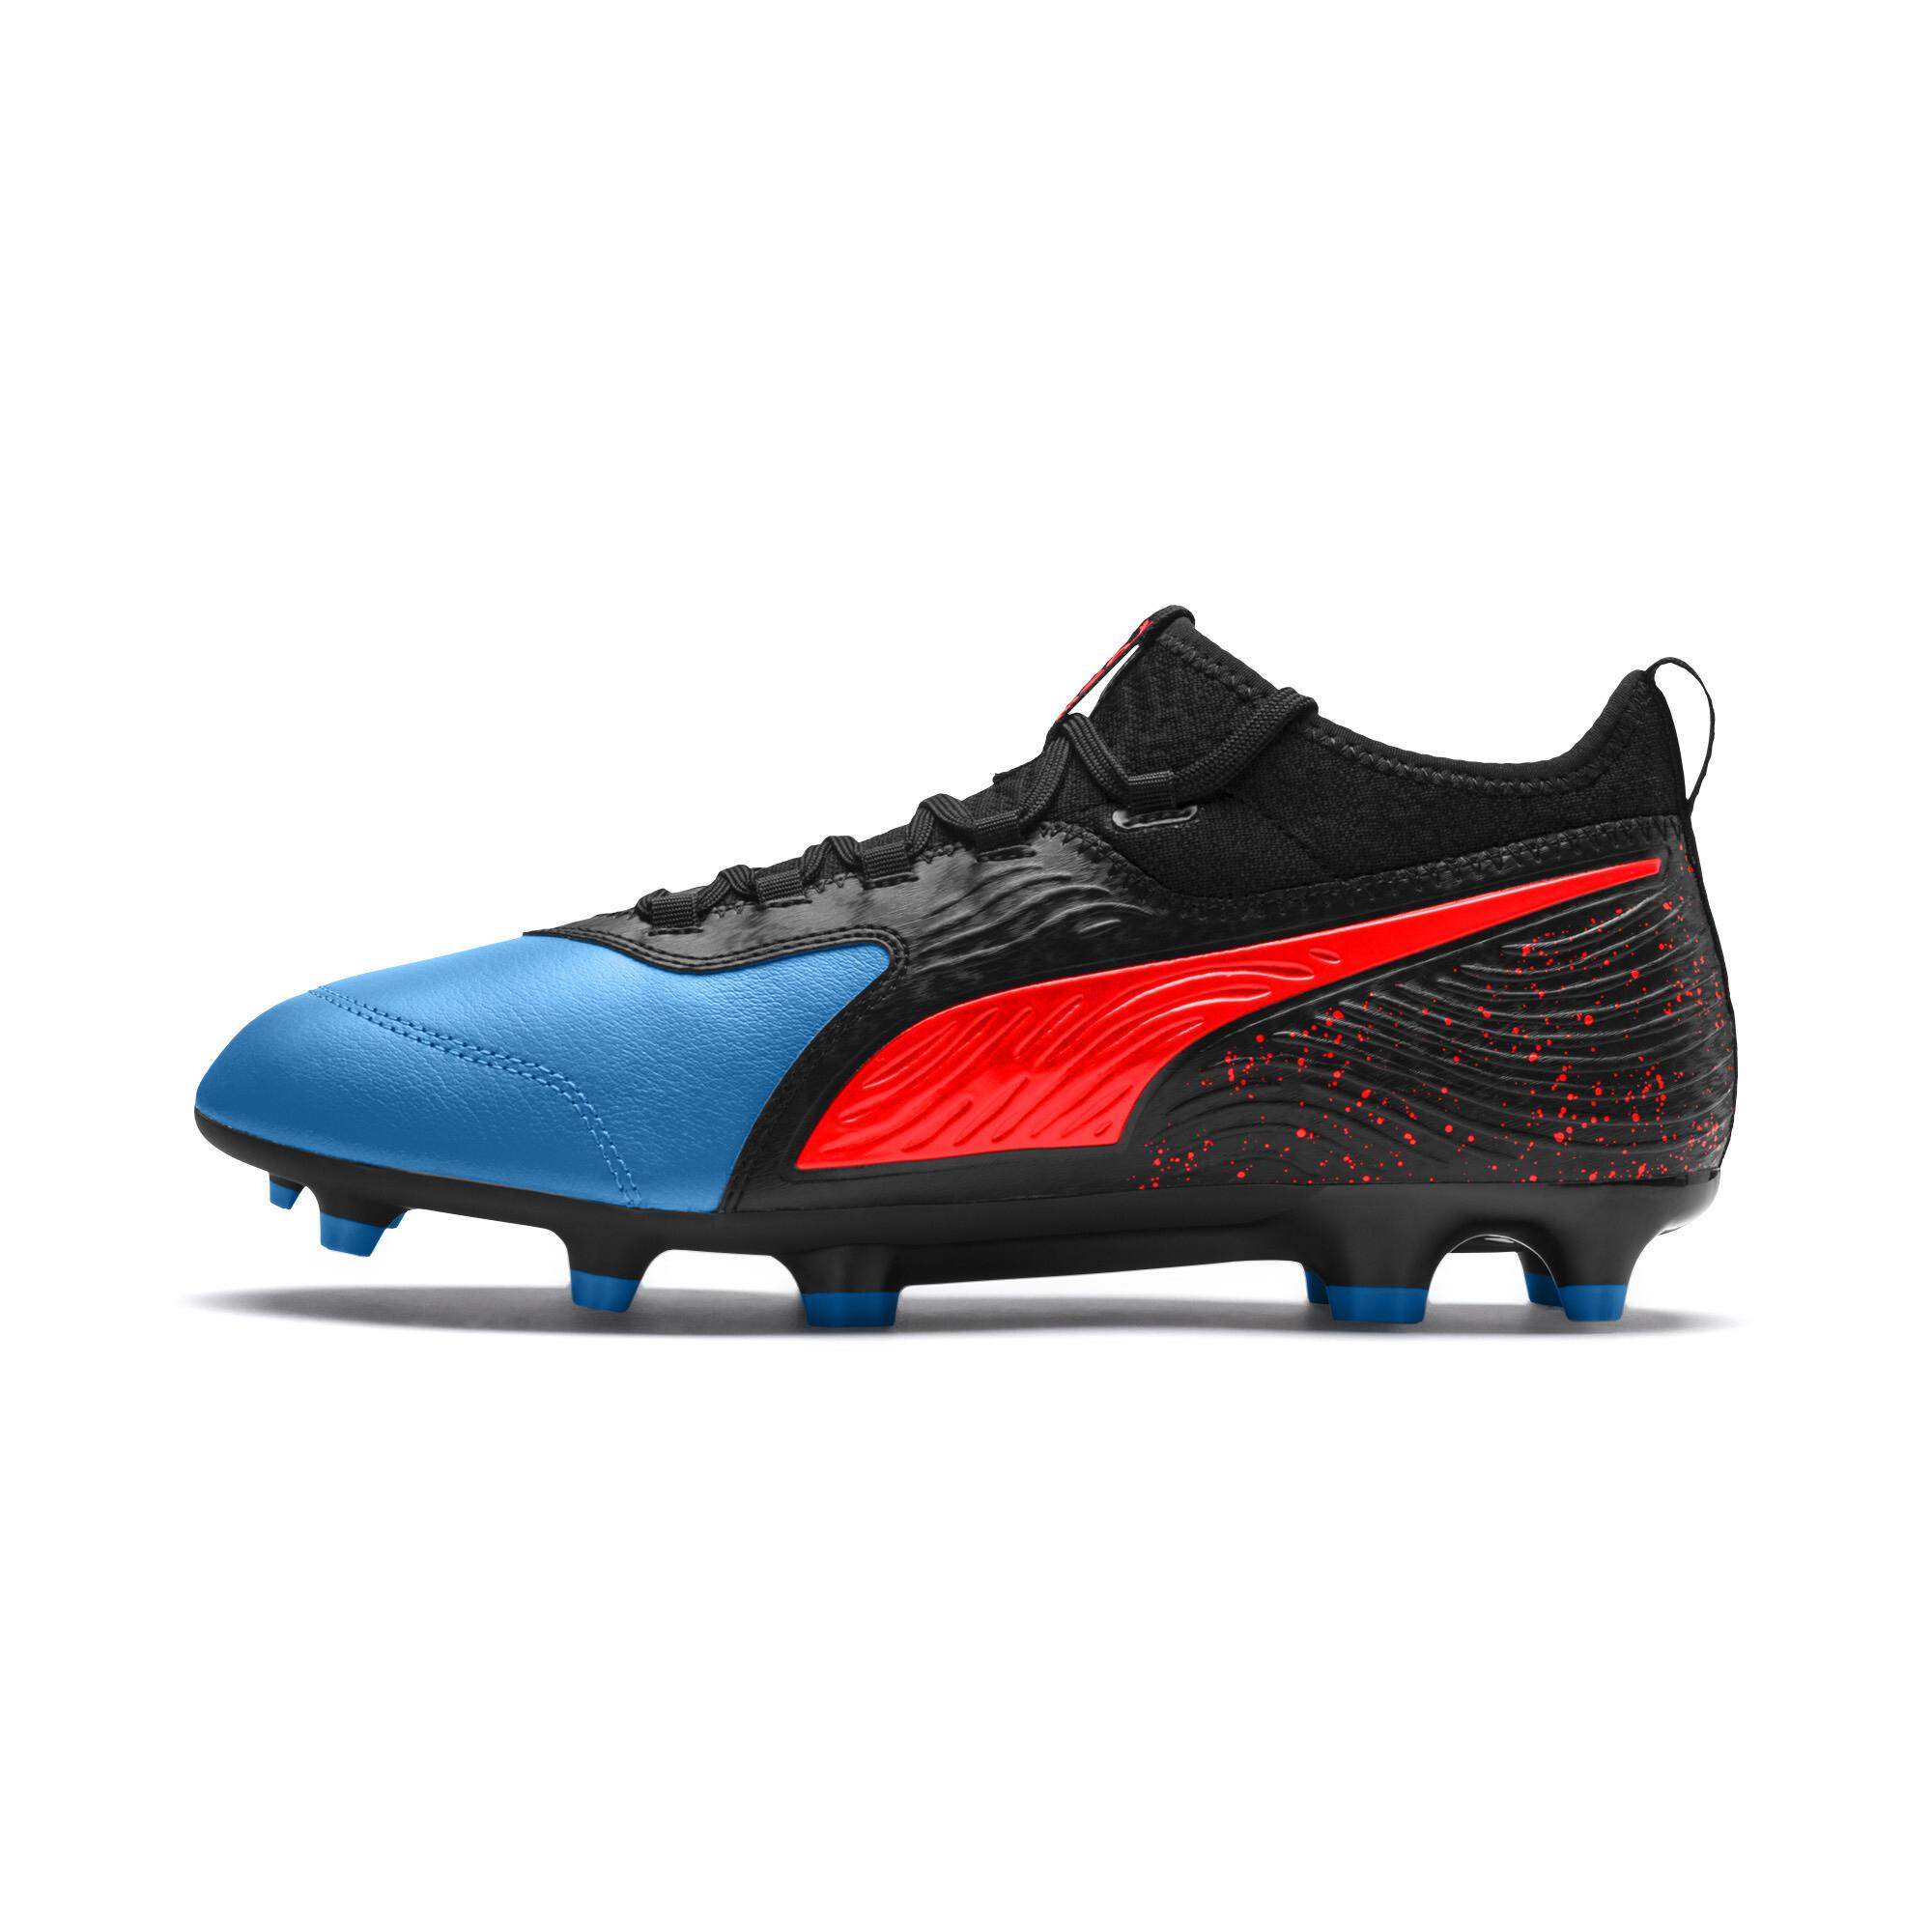 Image Puma PUMA ONE 19.3 FG/AG Men's Football Boots #1